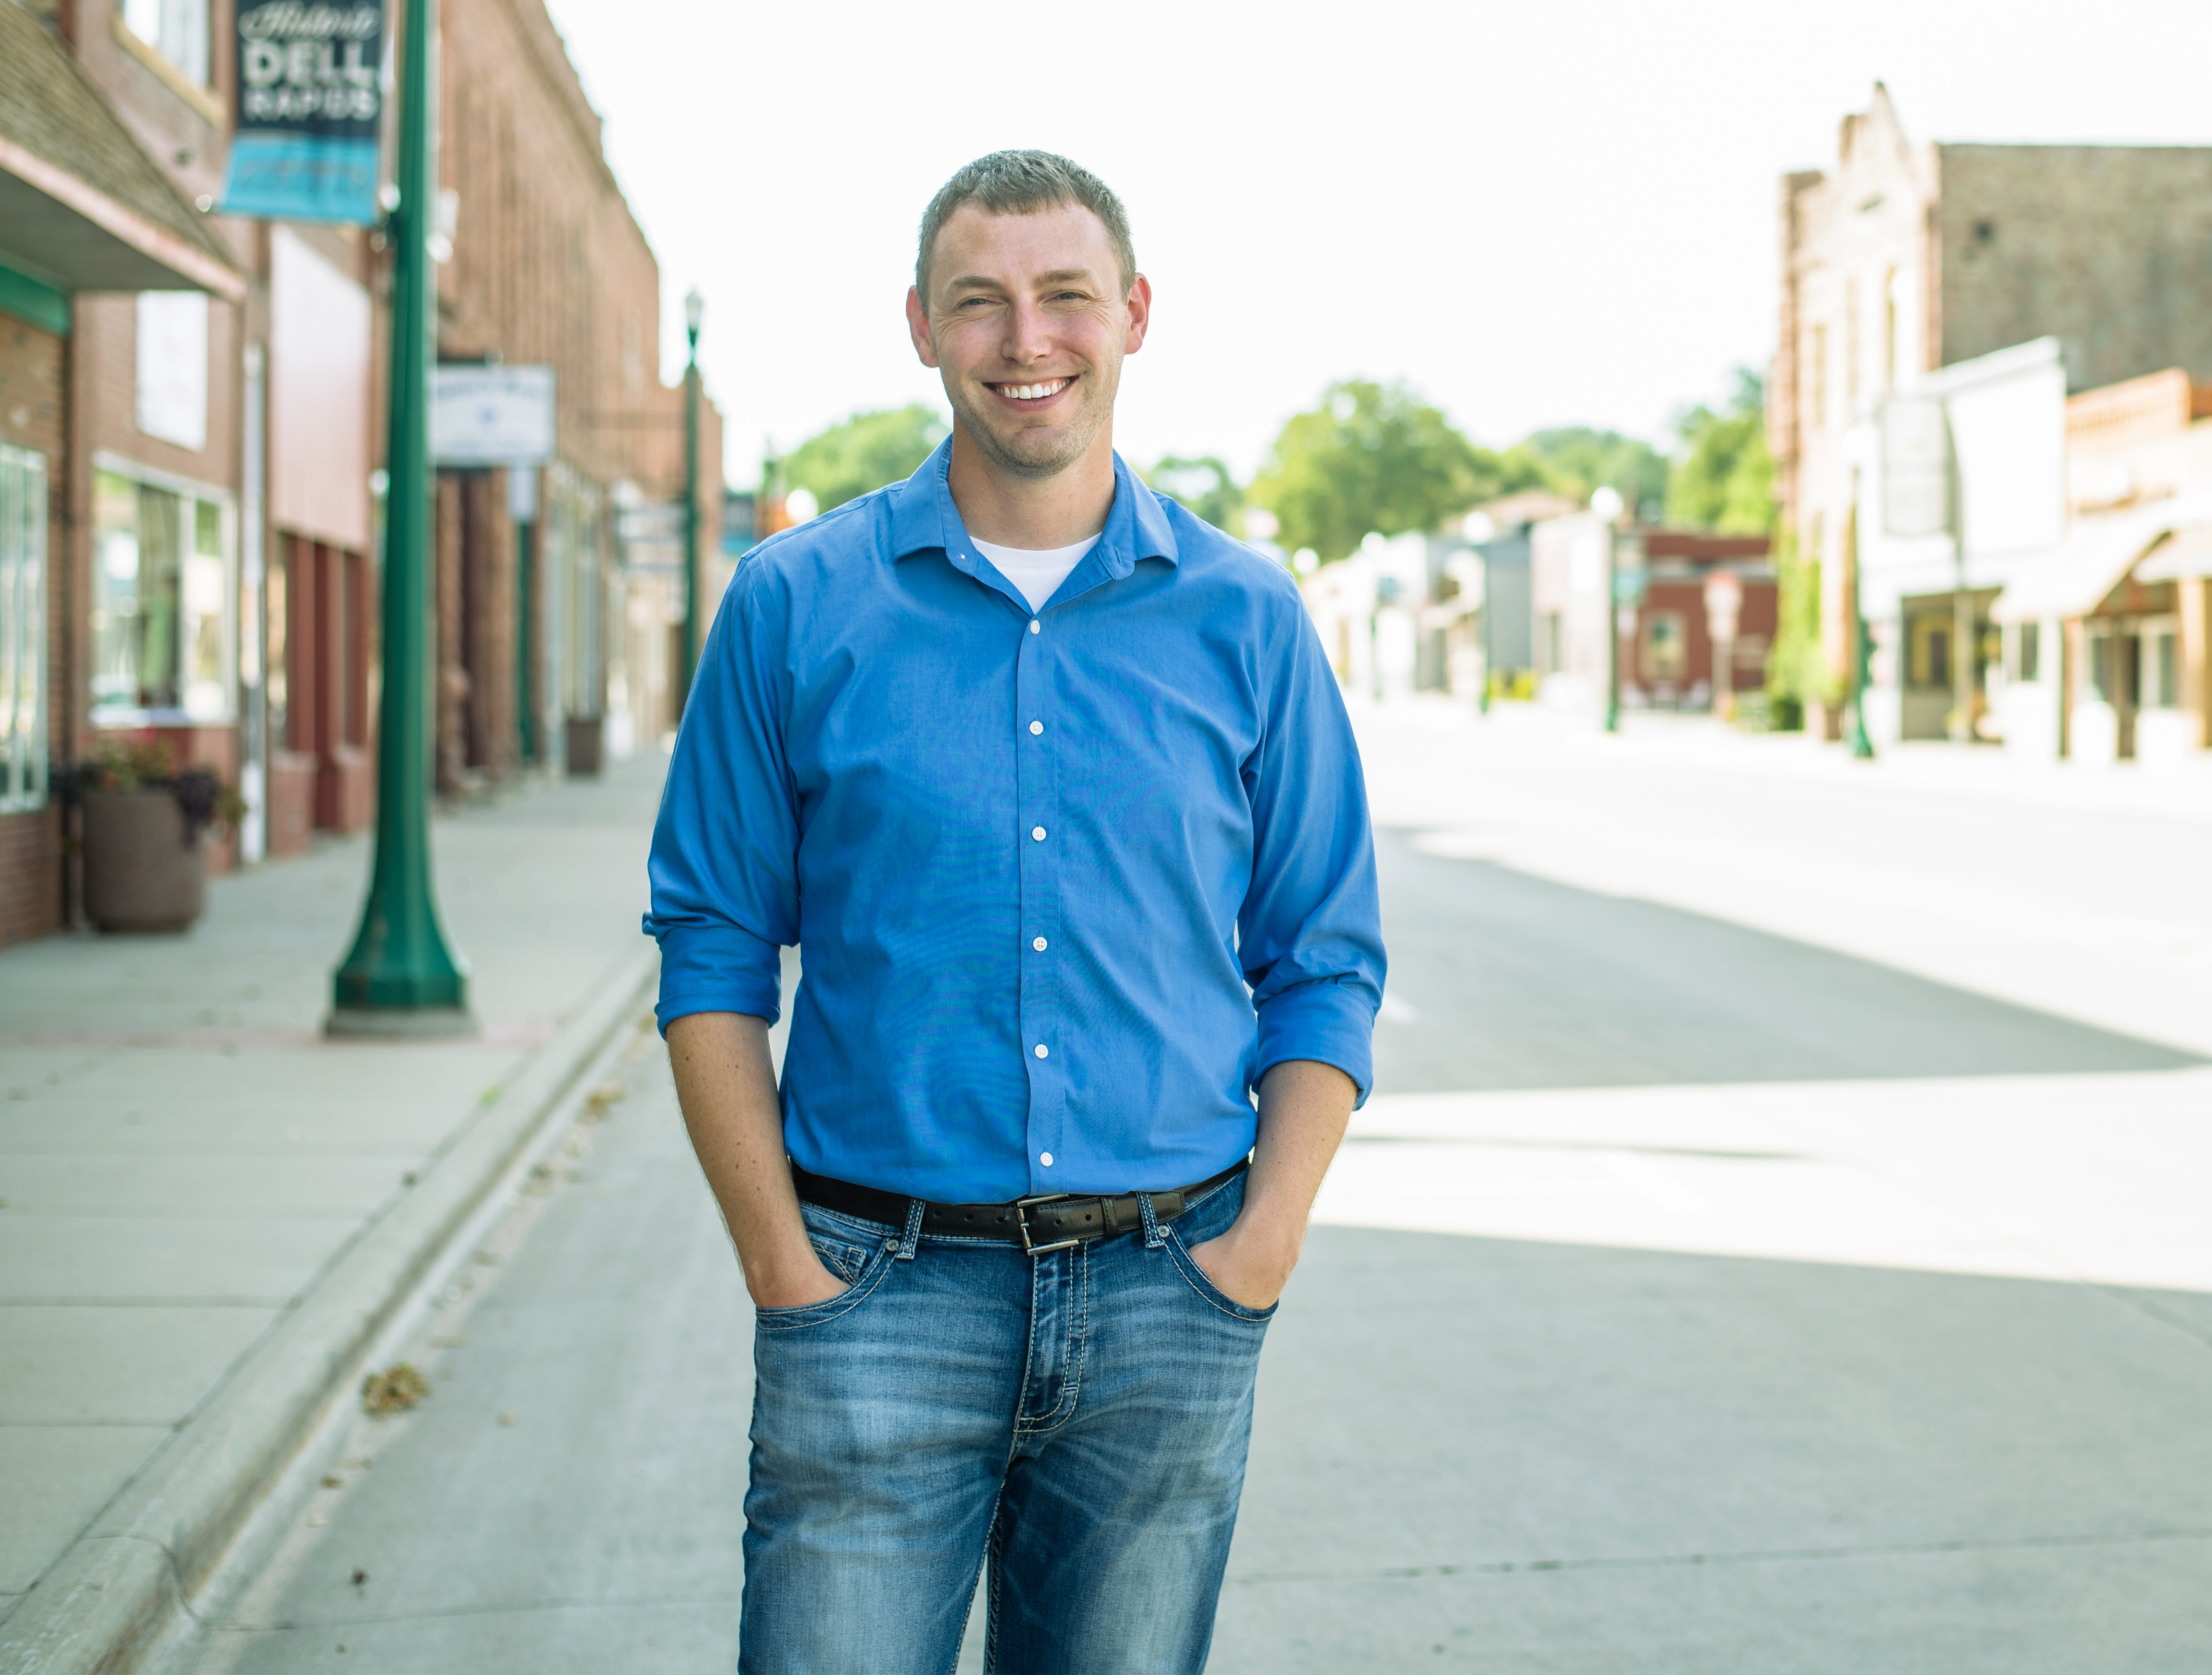 Jon Hansen is running to represent District 25 in the South Dakota House of Representatives.